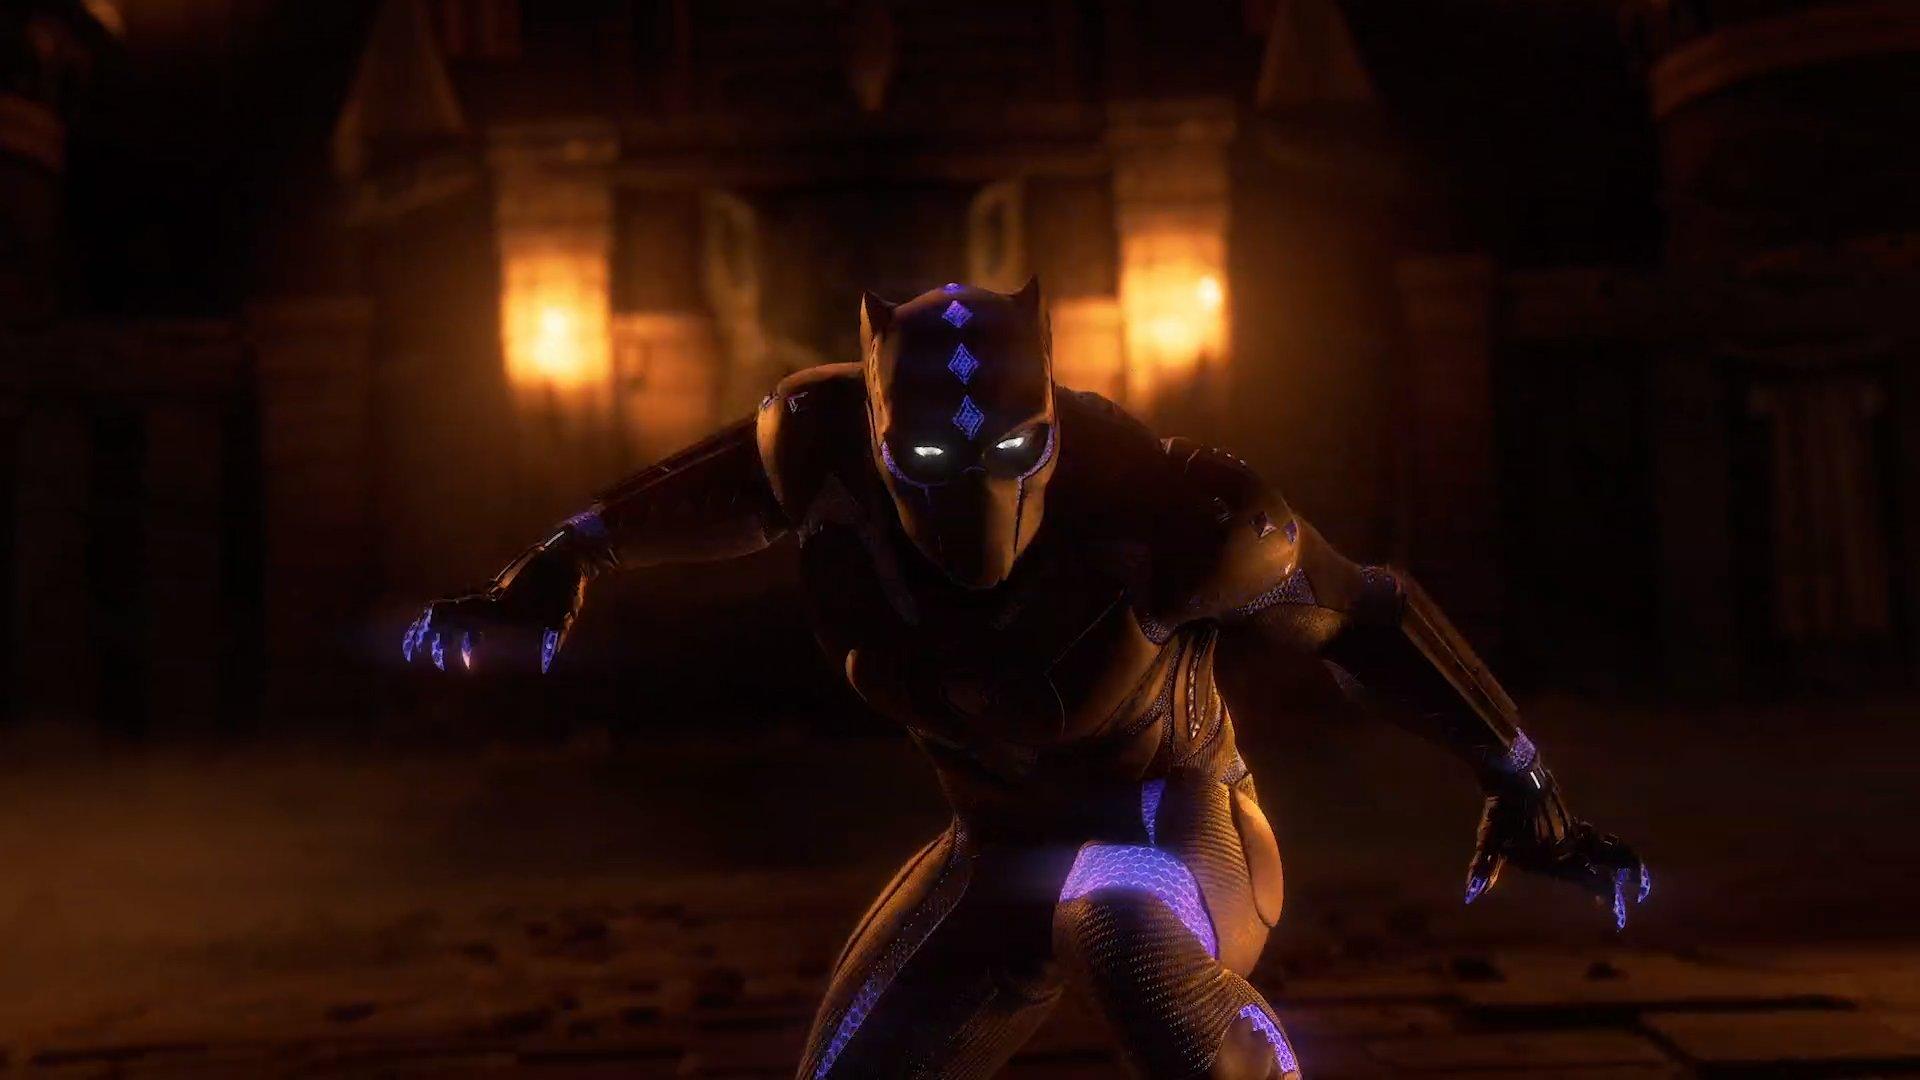 Marvel's Avengers - Black Panther